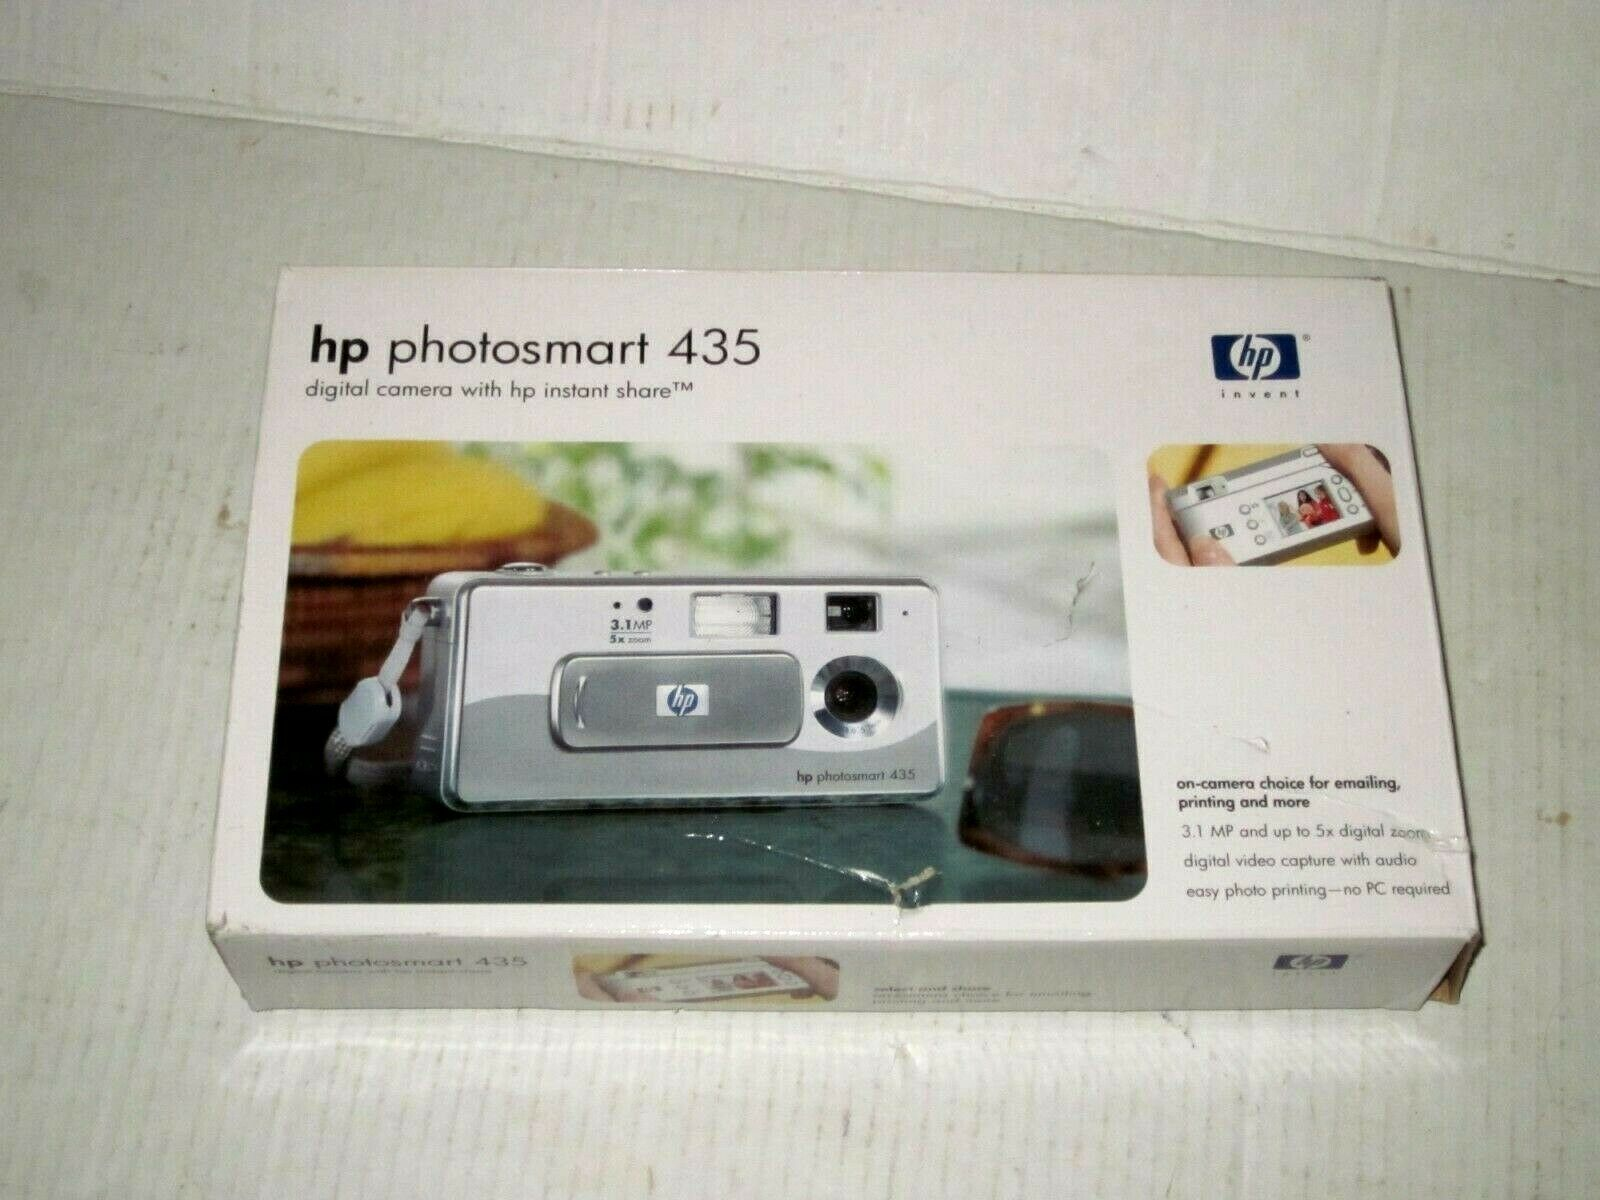 SD 1 Twin Pack HP PhotoSmart 620 Digital Camera Memory Card 2 x 2GB Standard Secure Digital Memory Card